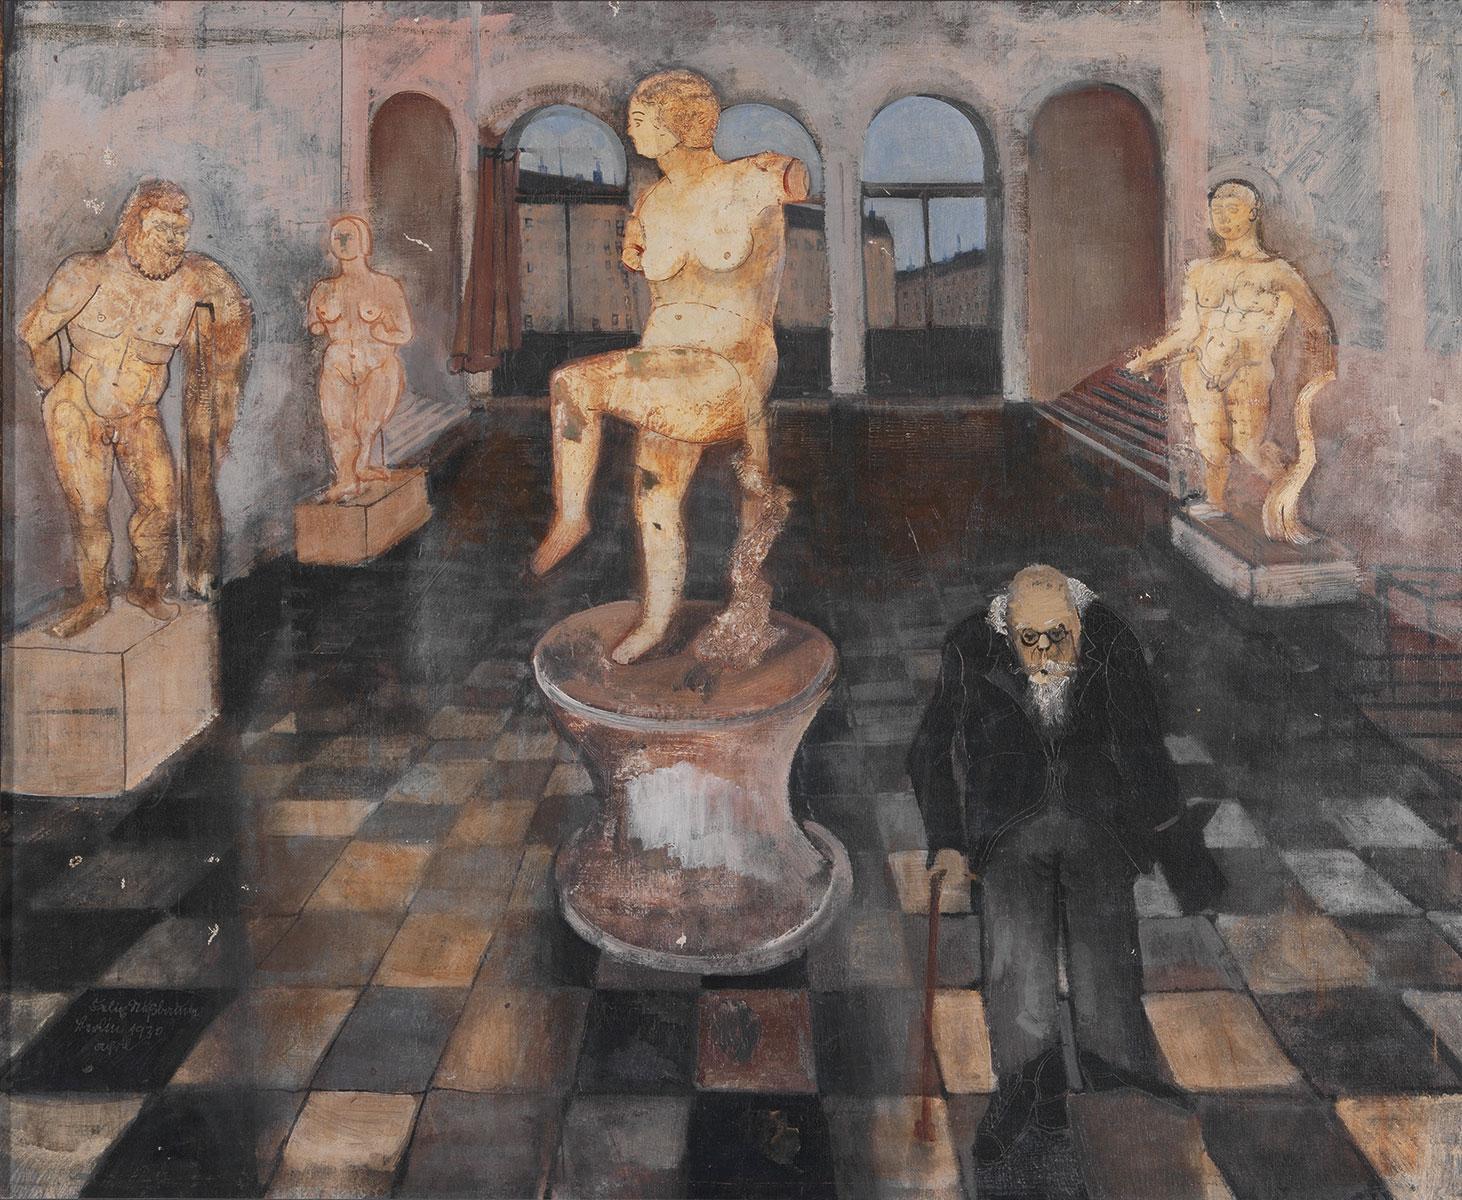 Felix Nussbaum, Antikensaal, 1930, 57,2 × 76,2 cm; Felix-Nussbaum-Haus Osnabrück